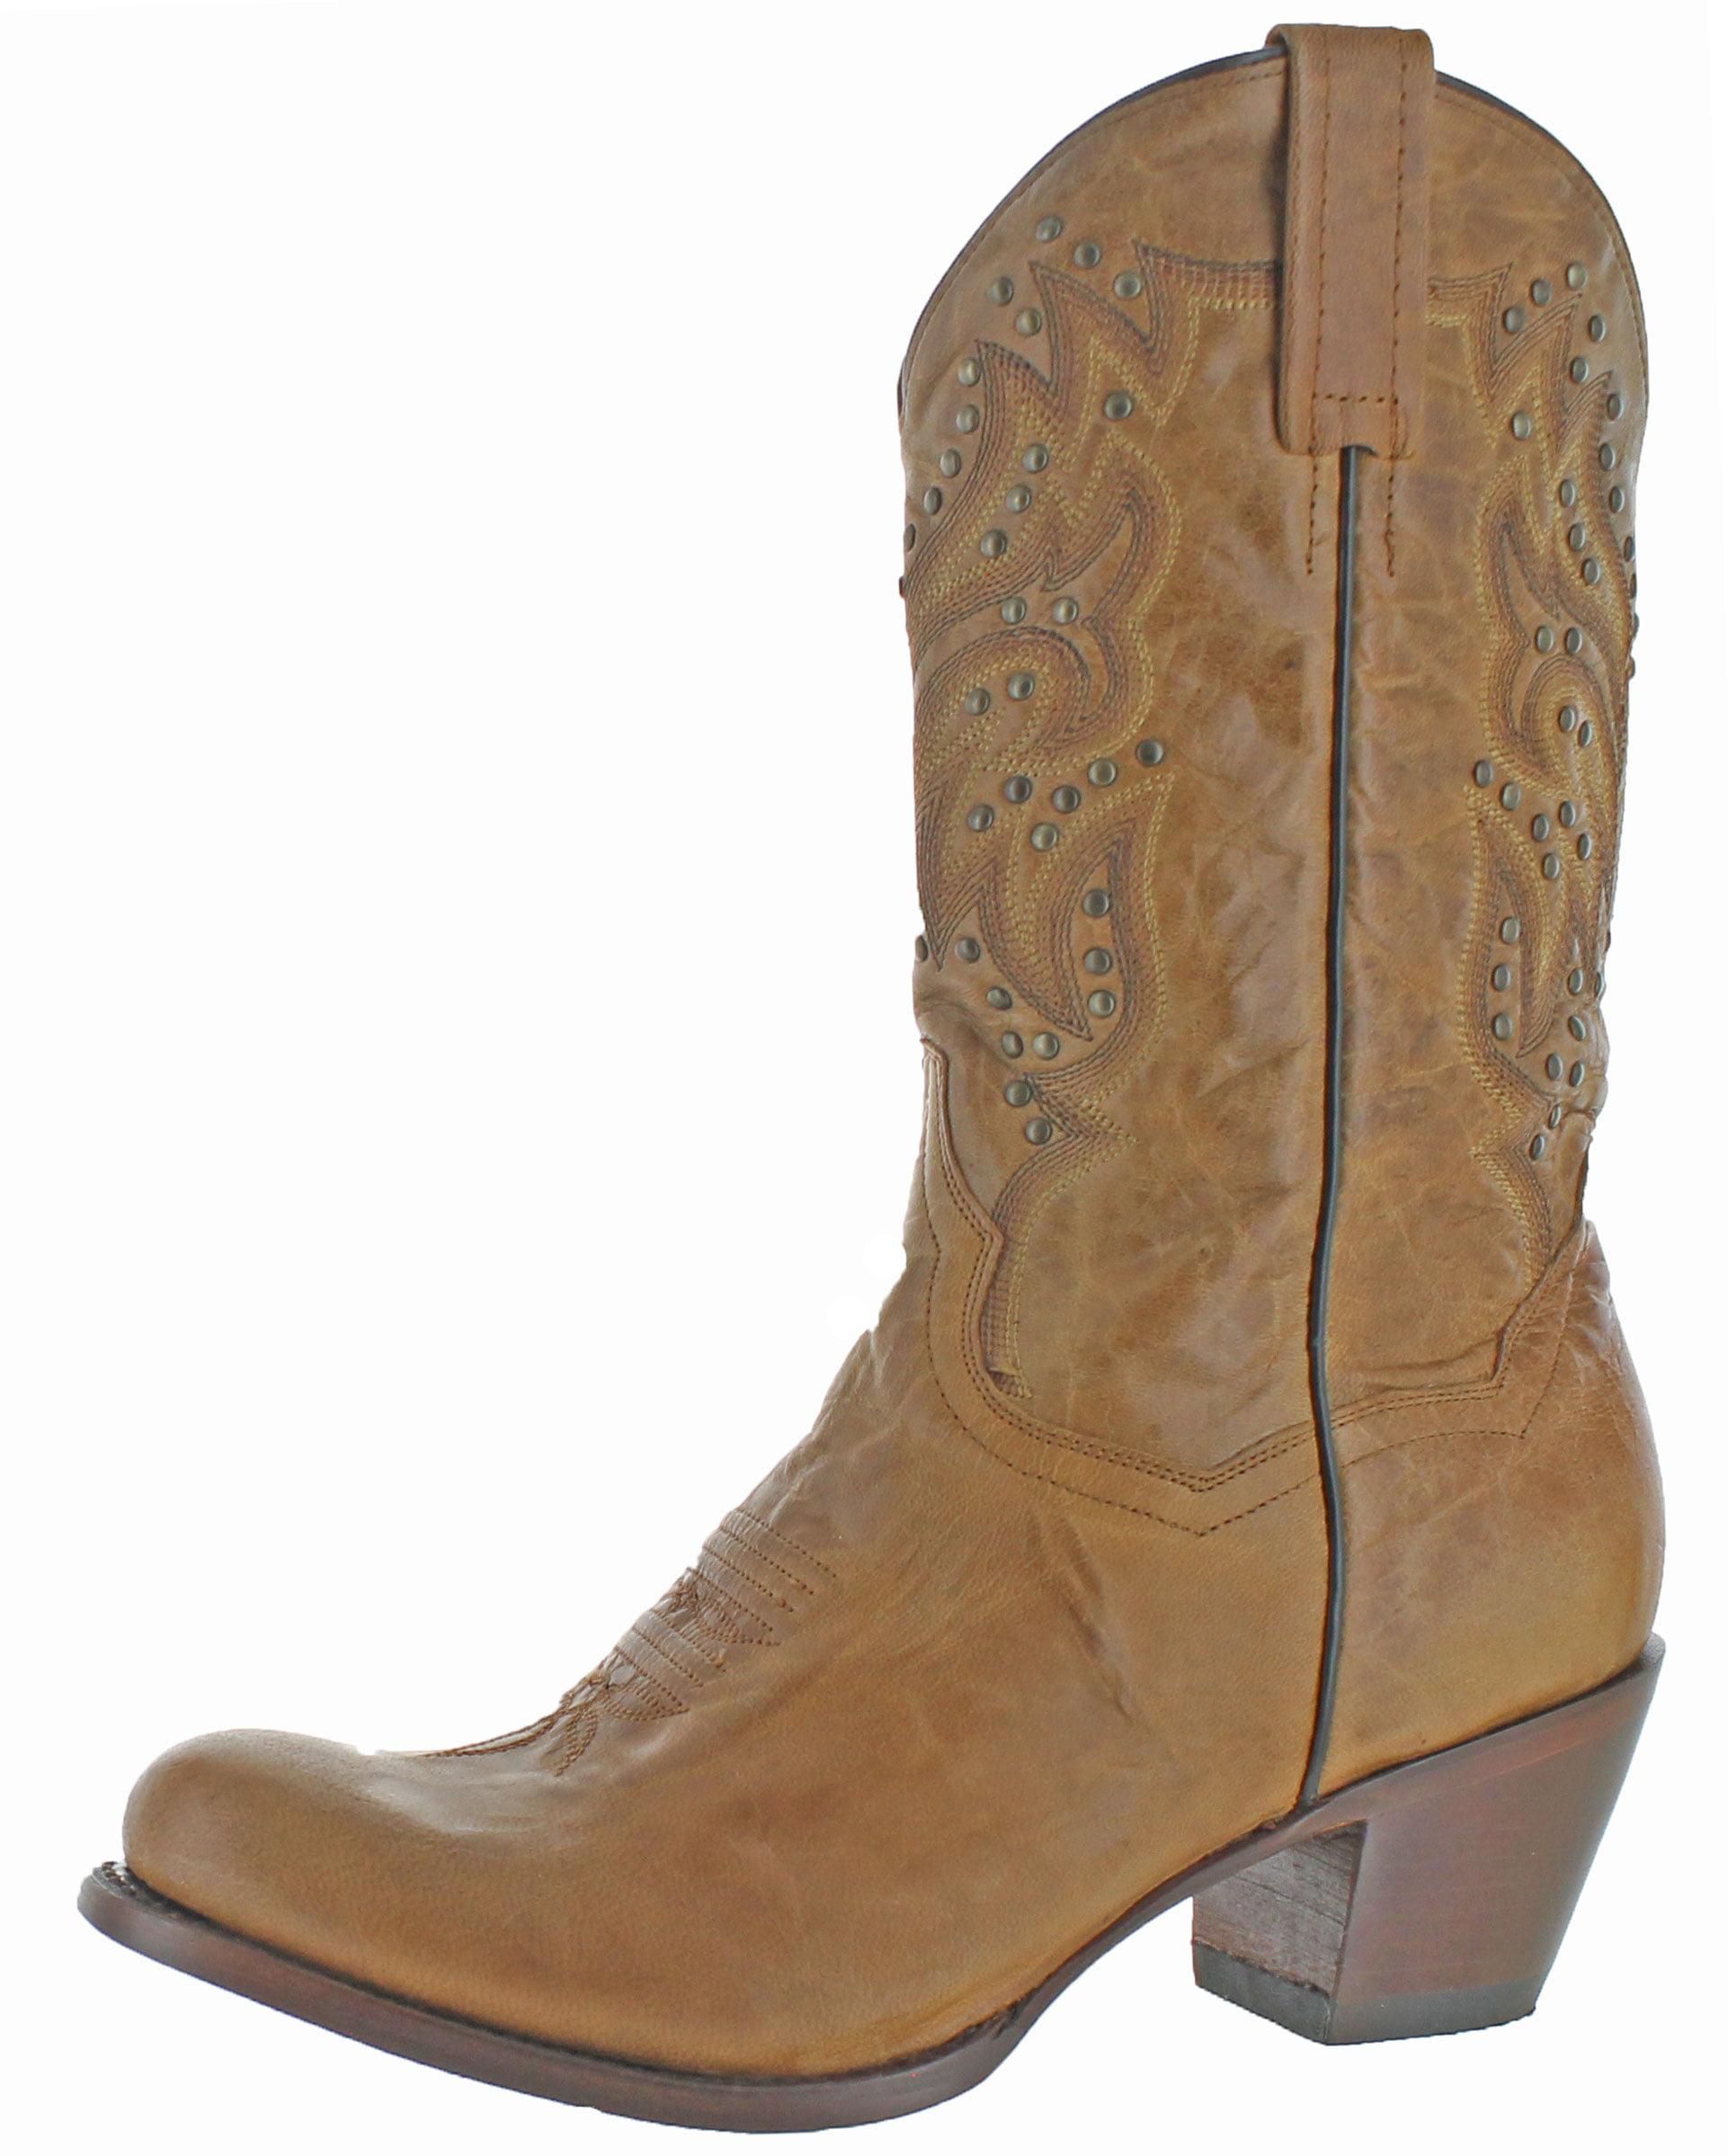 "Dan Post Western Boots Womens 11"" DP3515 Melba Cowboy Heel Brown DP3515 11"" 2065e4"